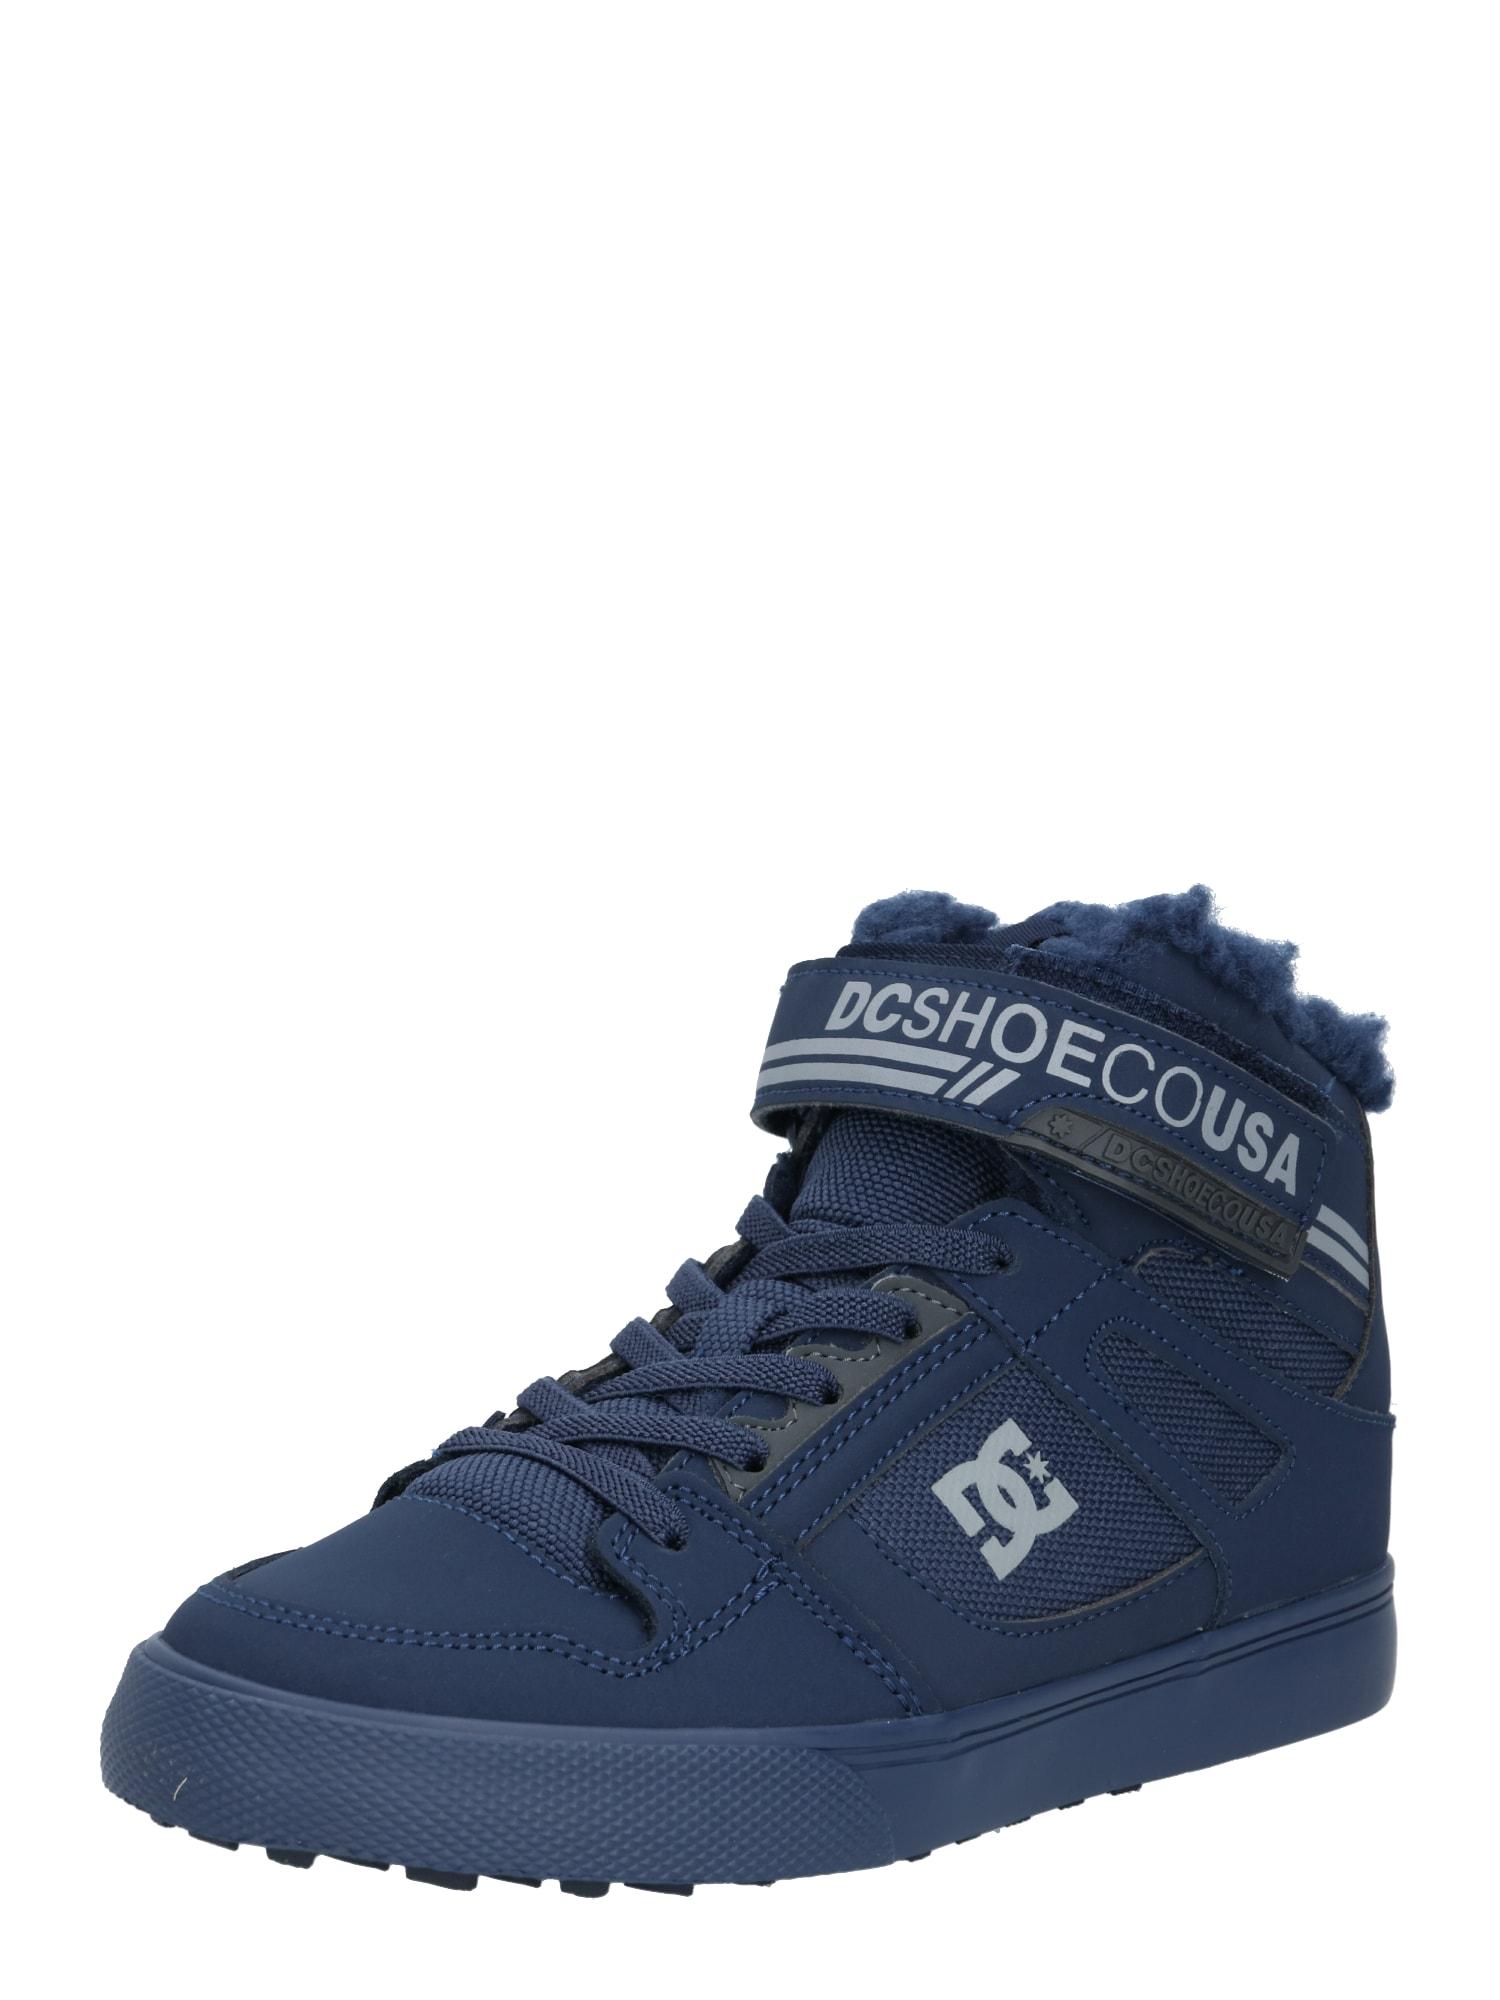 DC Shoes Auliniai batai su kulniuku pilka / tamsiai mėlyna